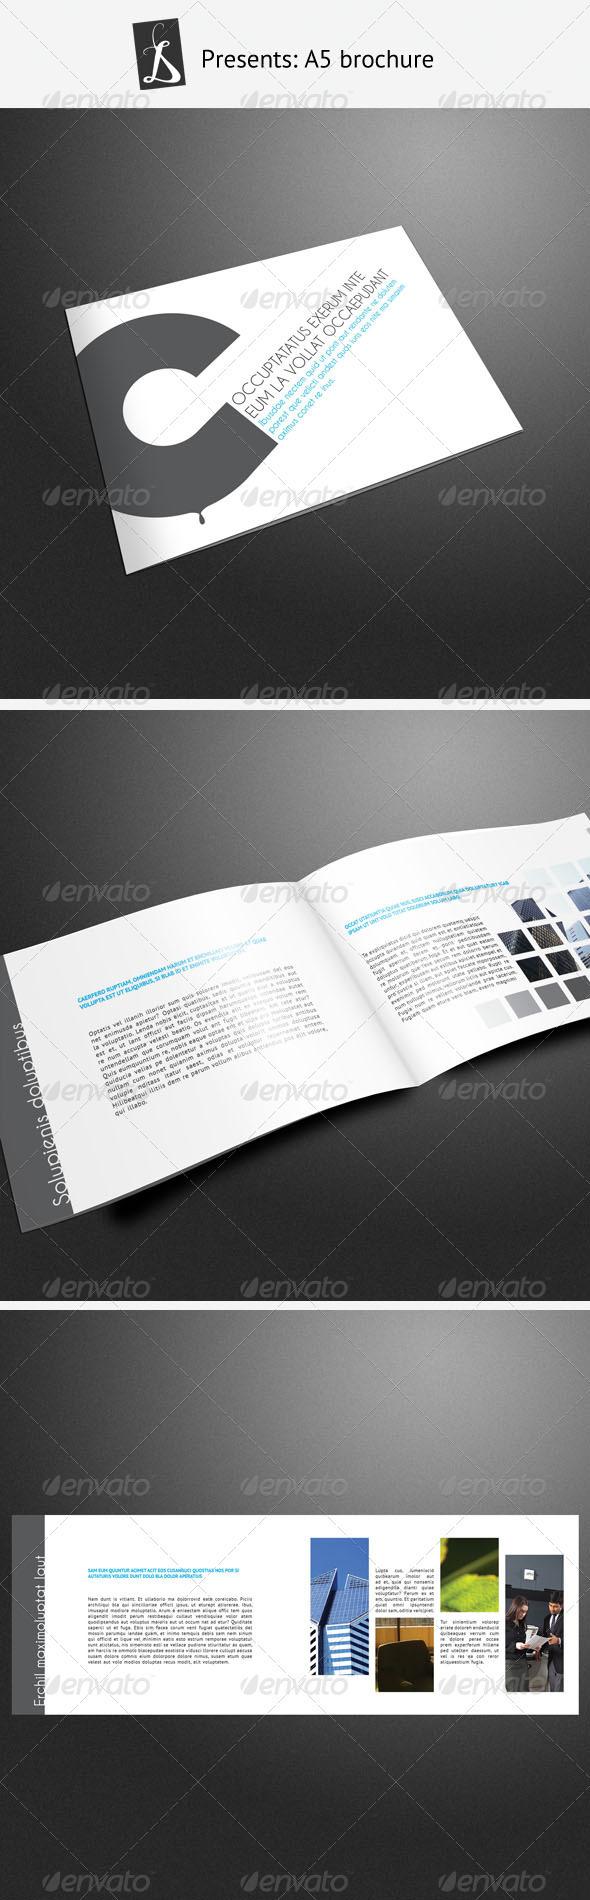 A5 Brochure 4 - Corporate Brochures